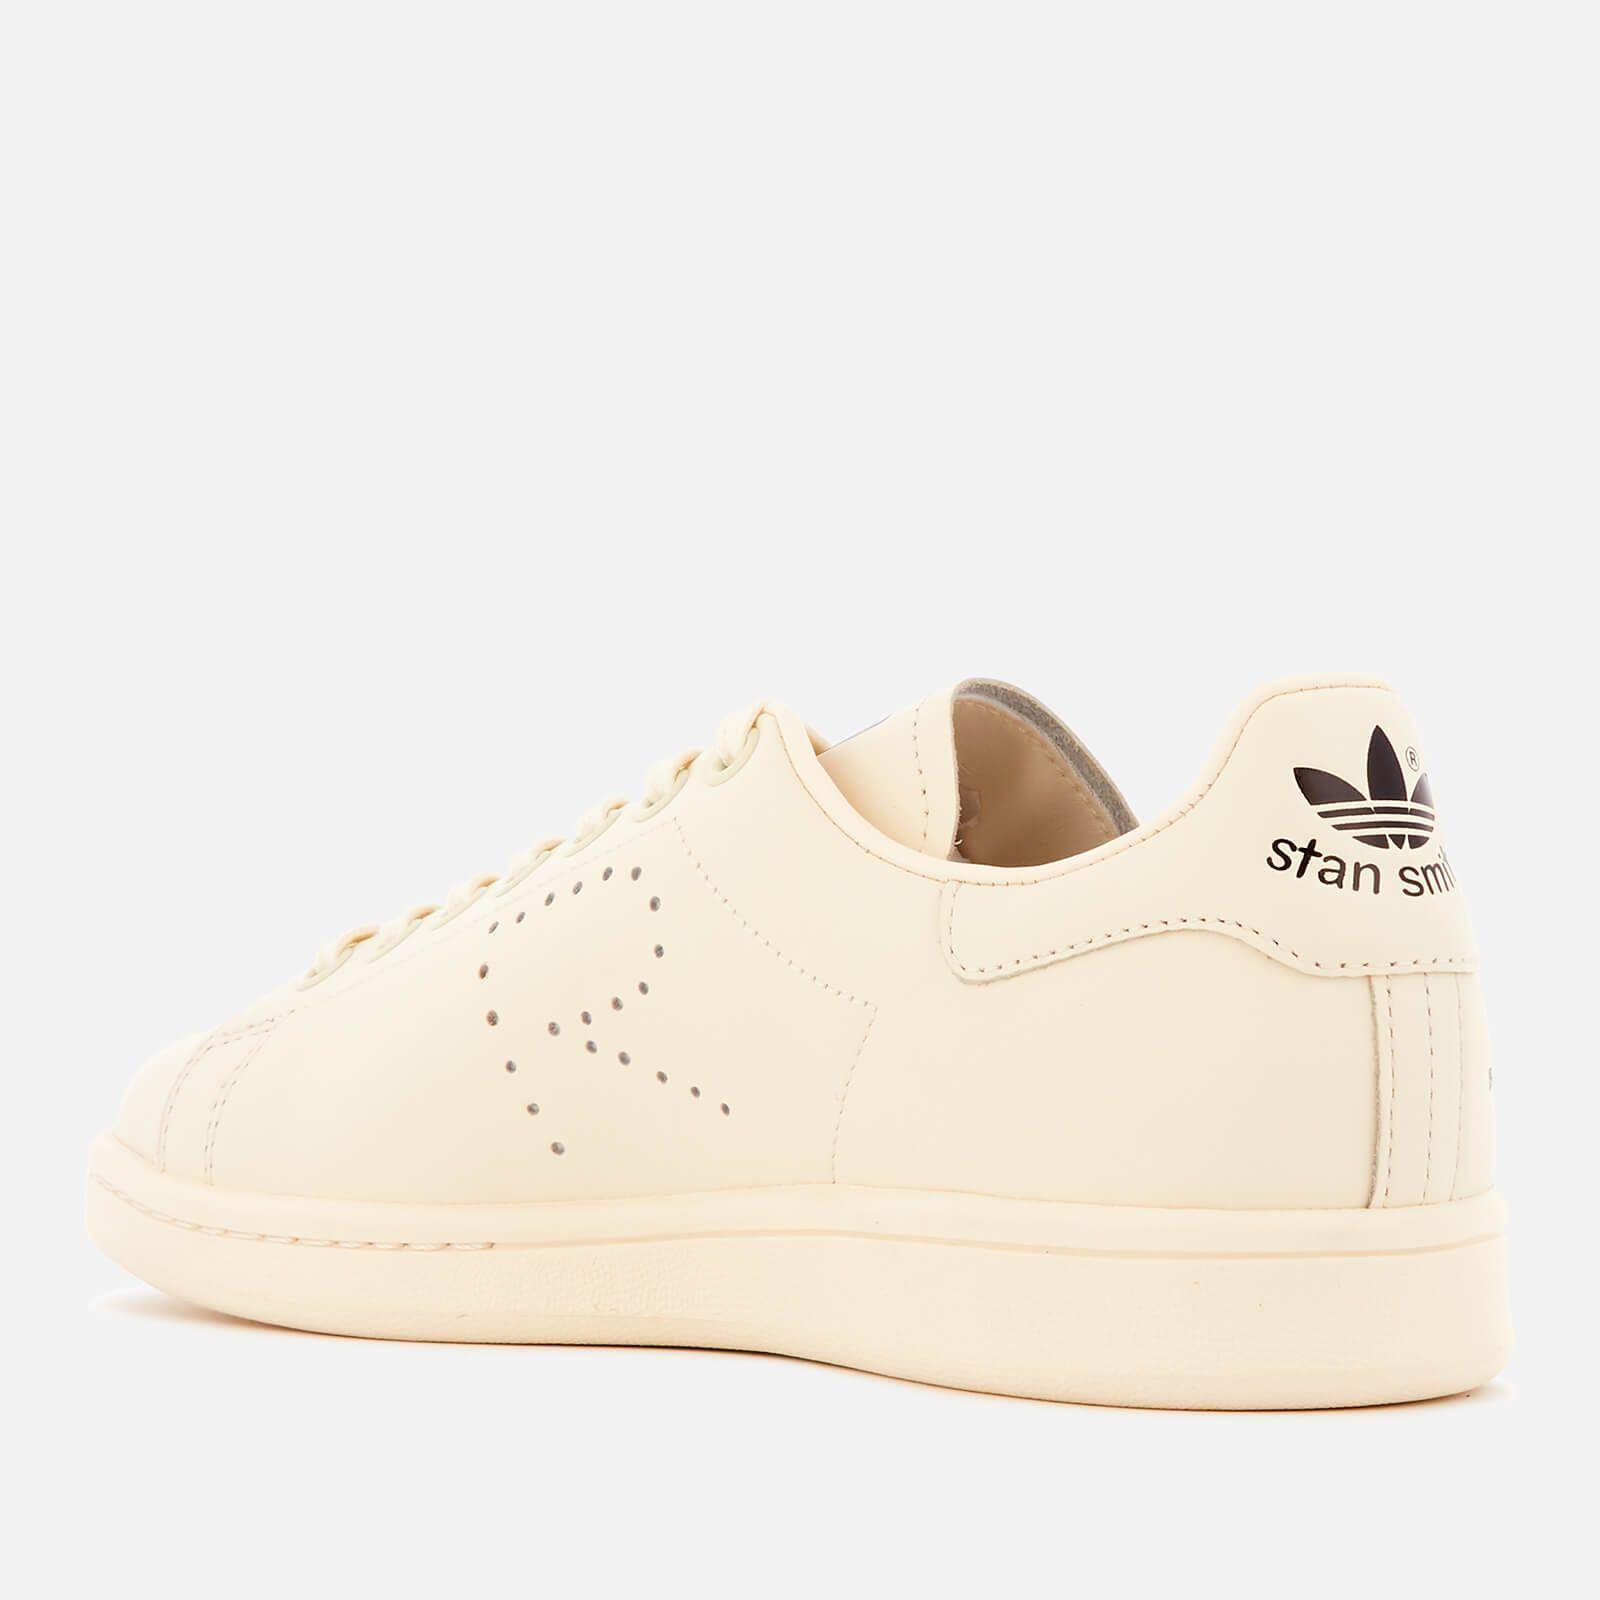 sale retailer b0a47 003e7 adidas by Raf Simons Stan Smith Trainers - C White/C Brown ...